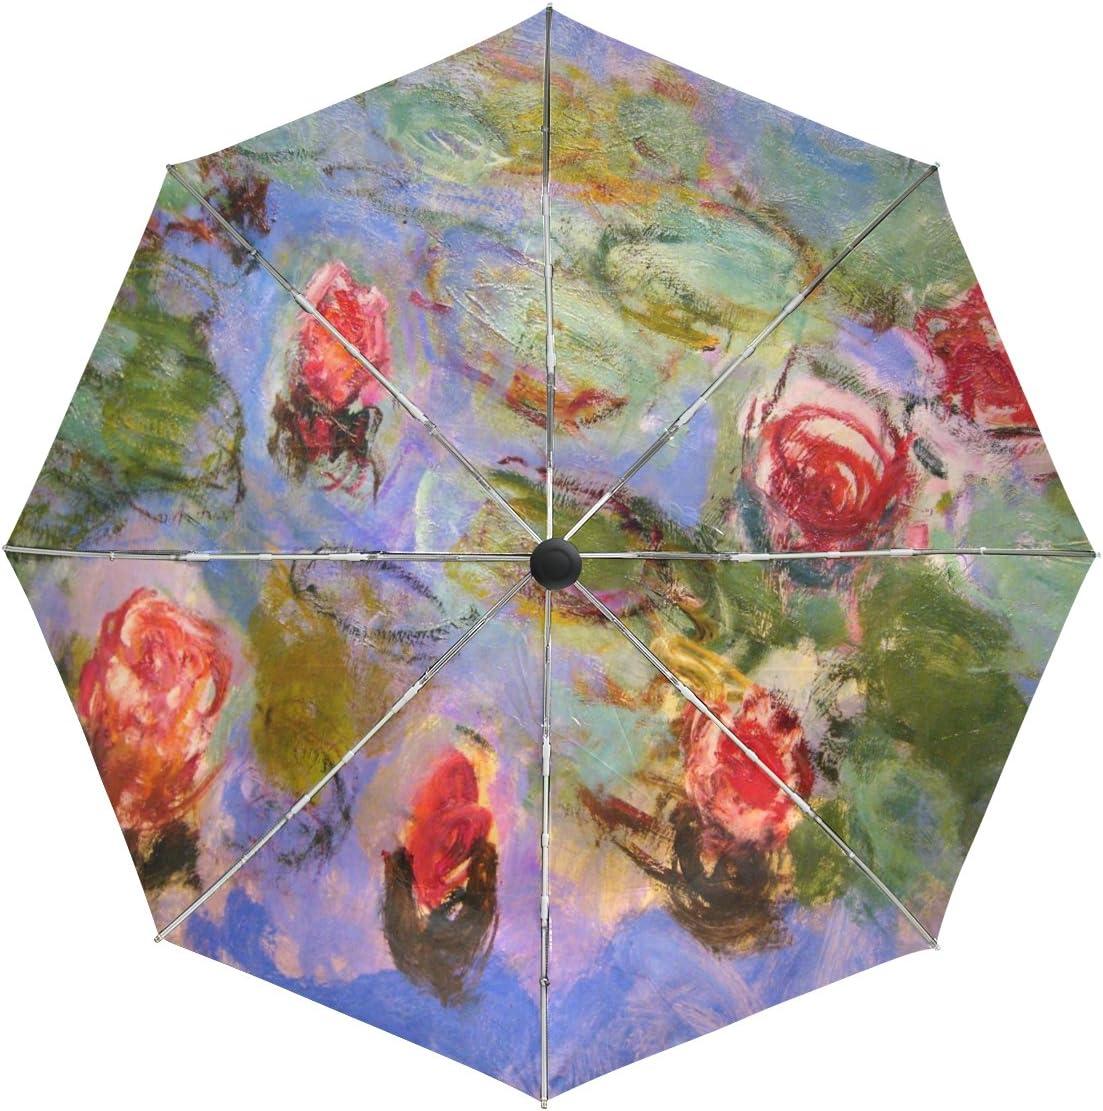 baihuishop Monet Painting Windproof Umbrellas Auto Close Open San Antonio Mall Popular 3